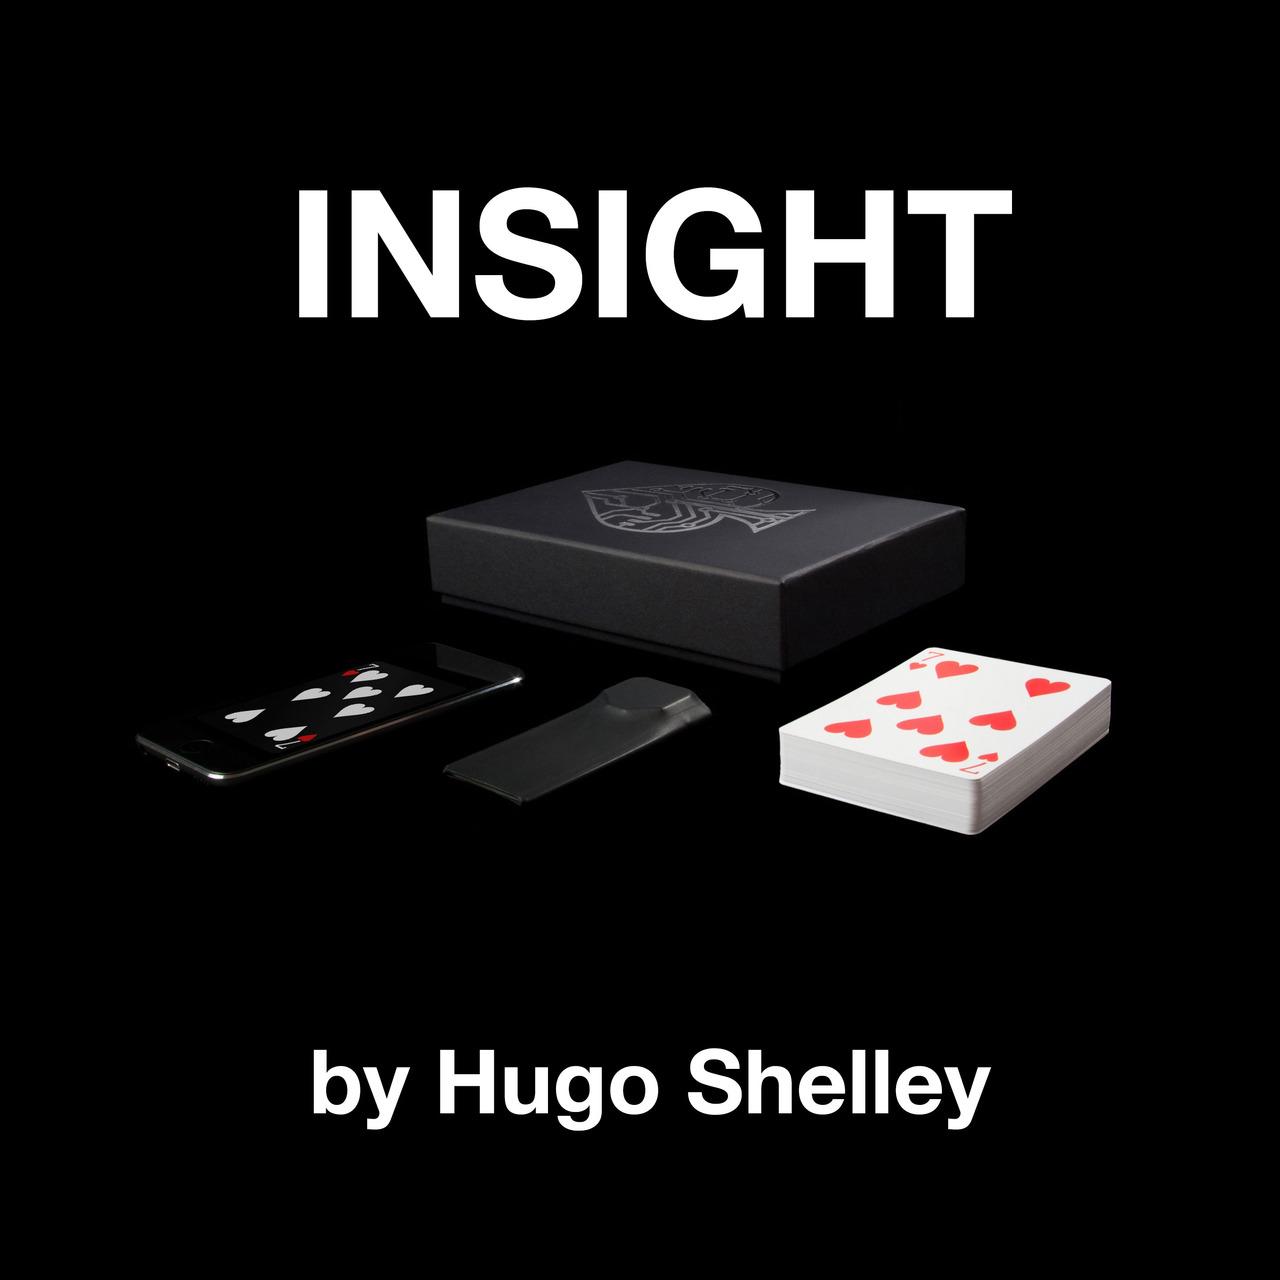 Insight by Hugo Shelley